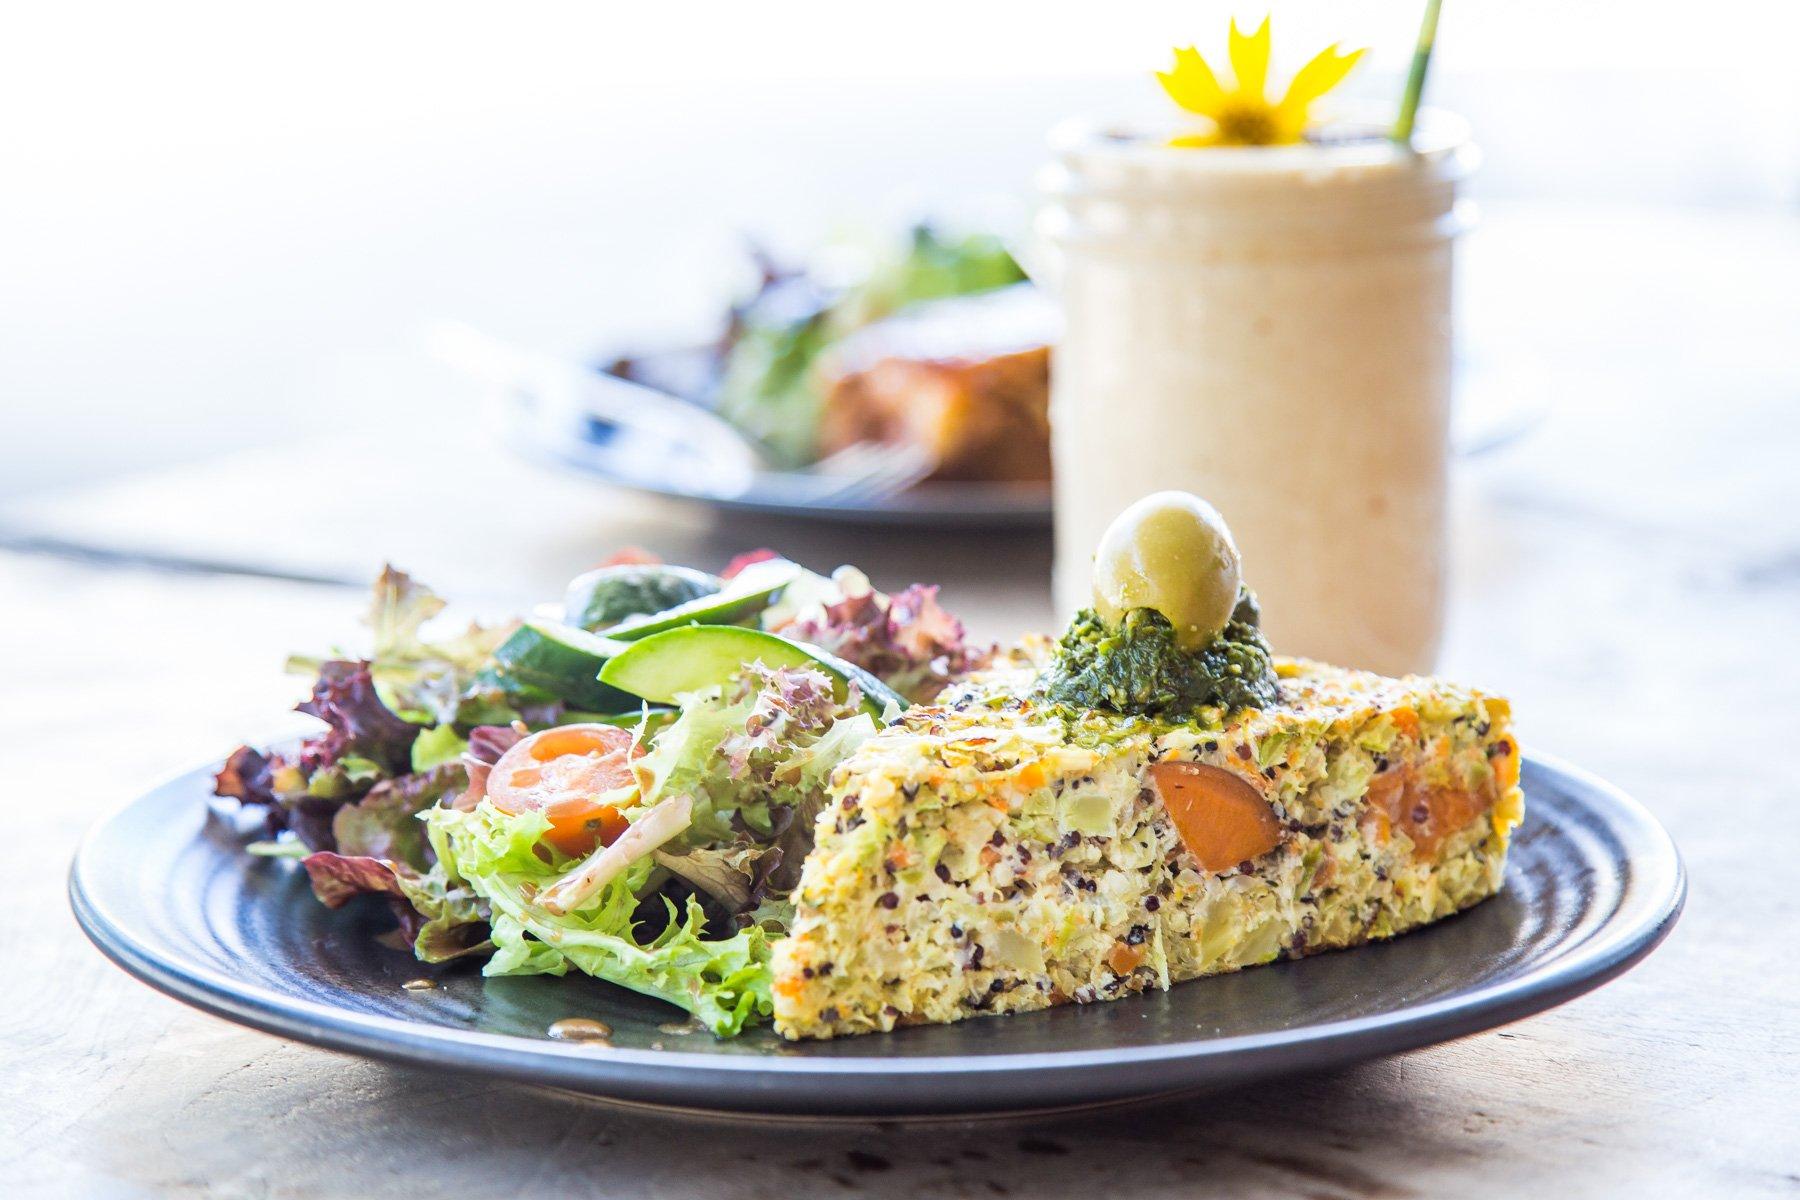 Blog Our Favourite Noosa Healthy Eats02